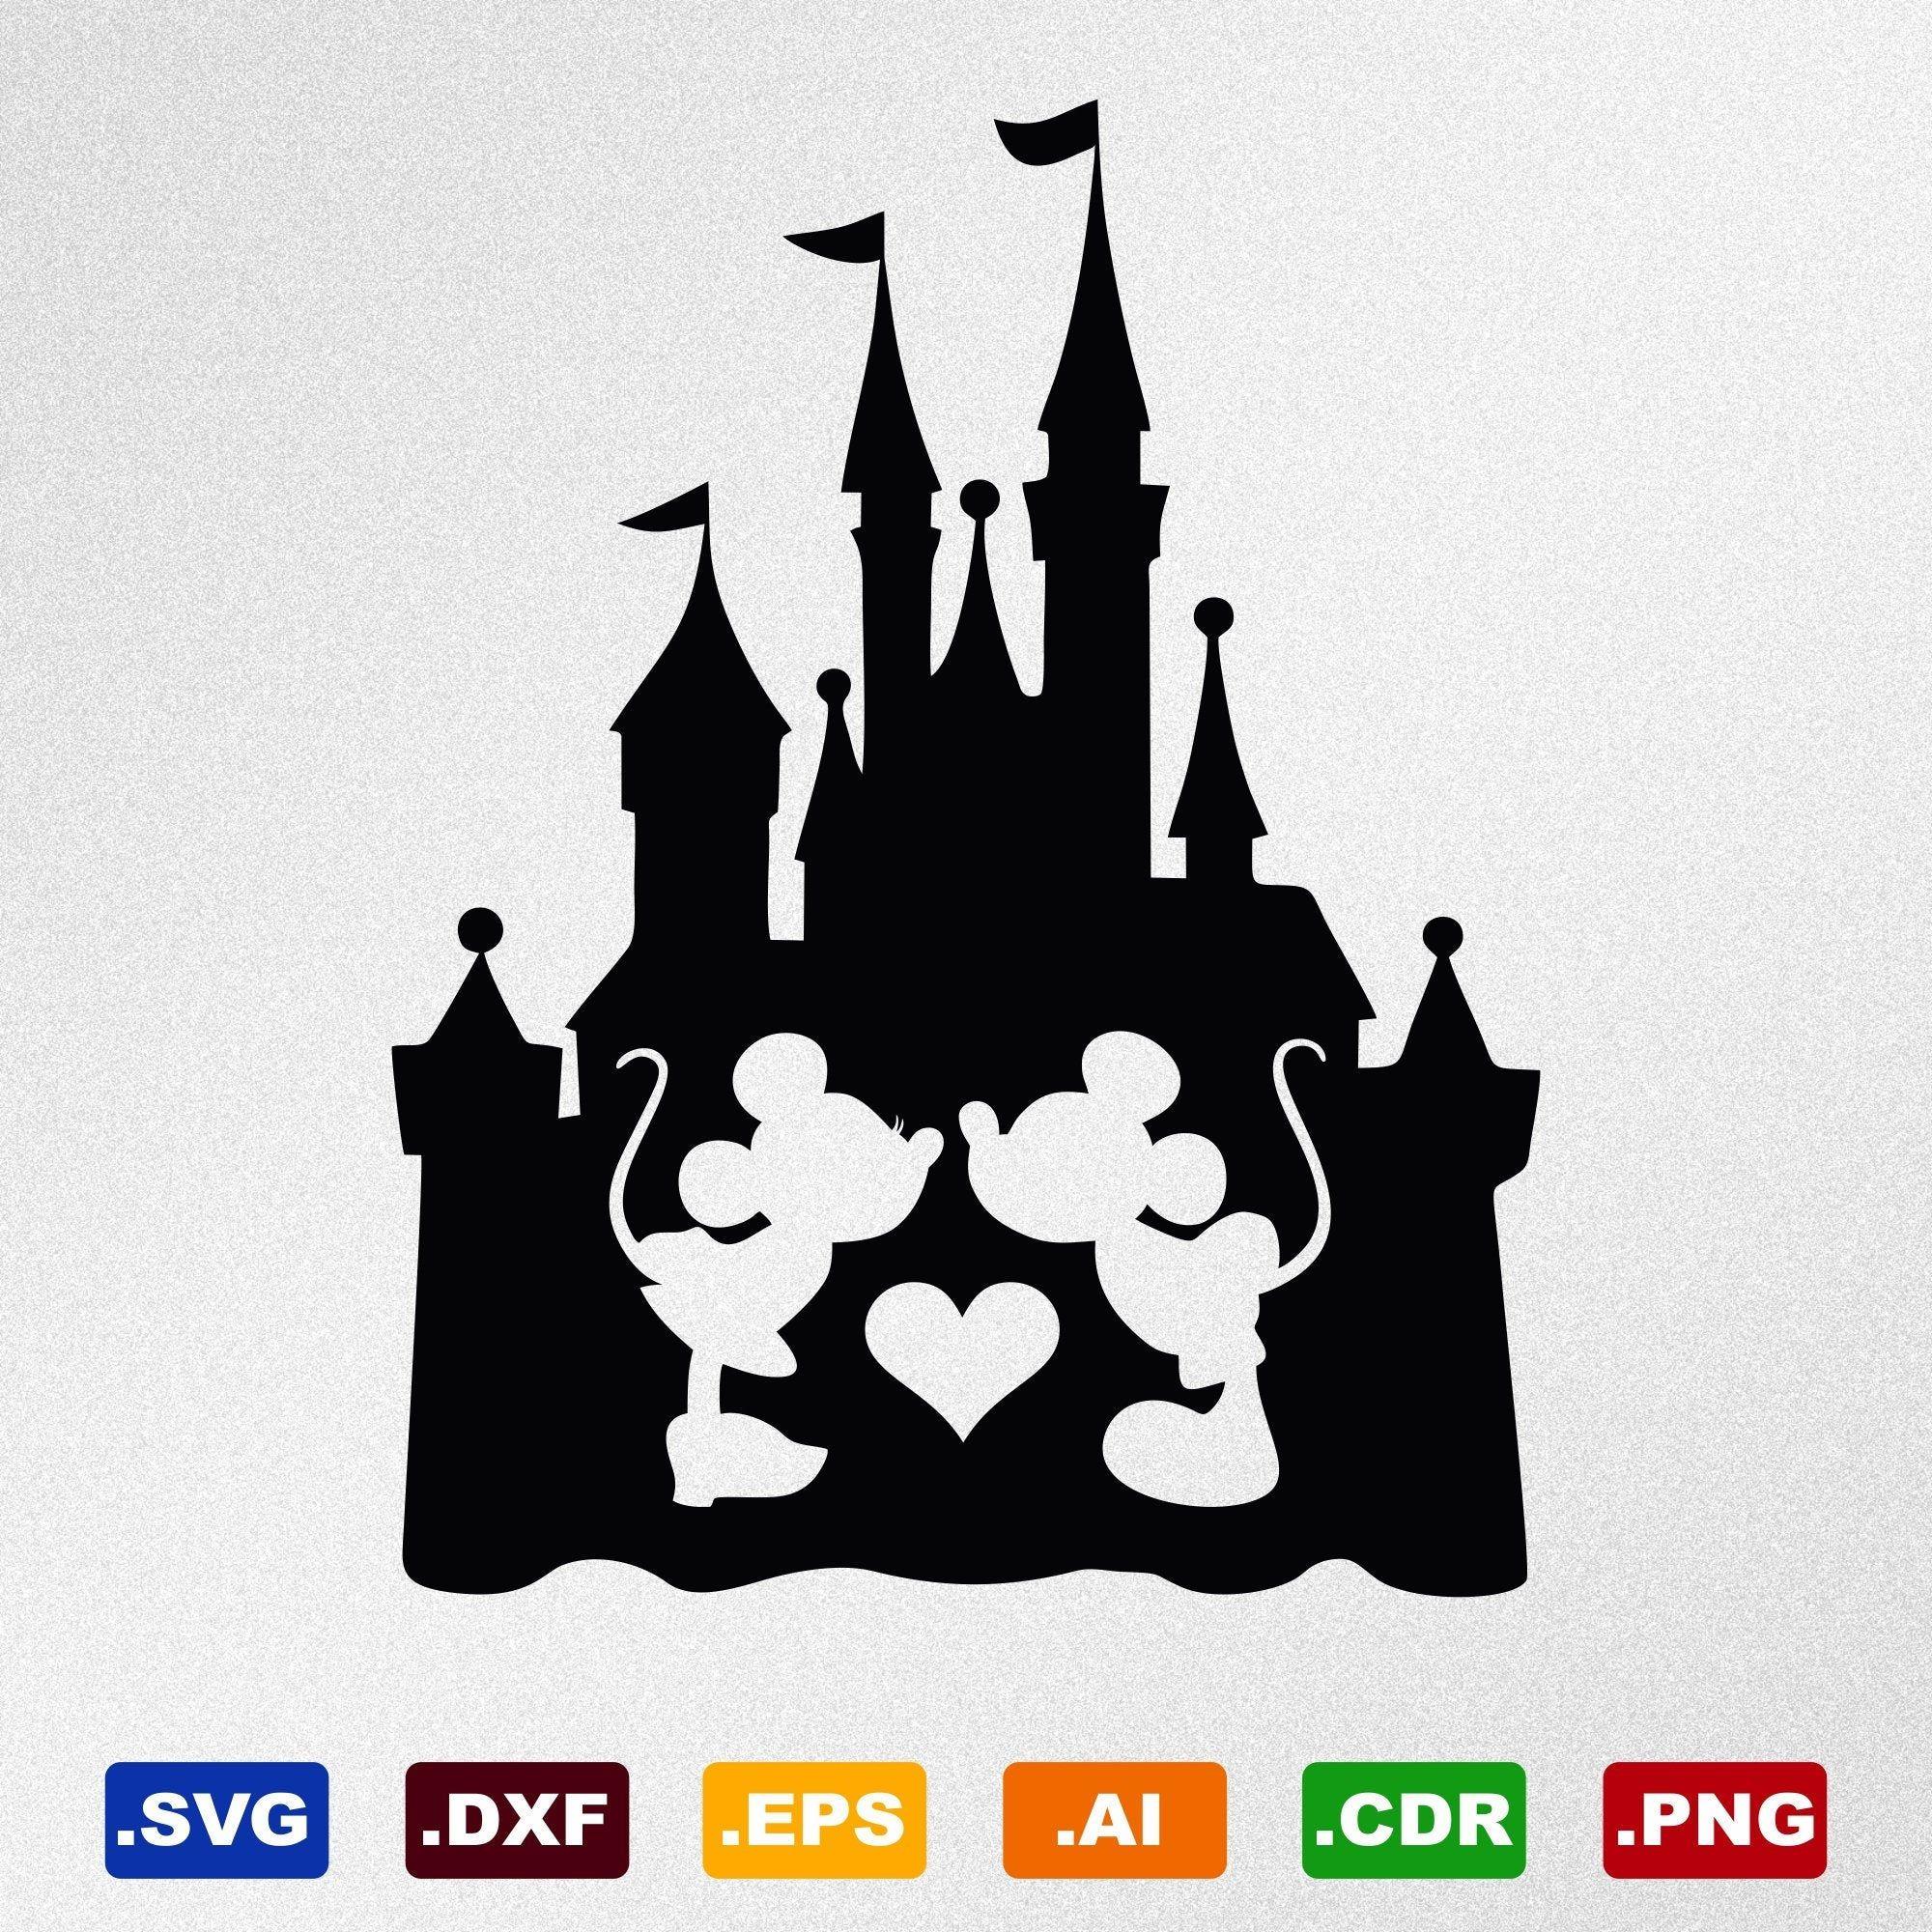 Disney Free Png Sites & Free Disney Sites.png Transparent Images #8941 -  PNGio